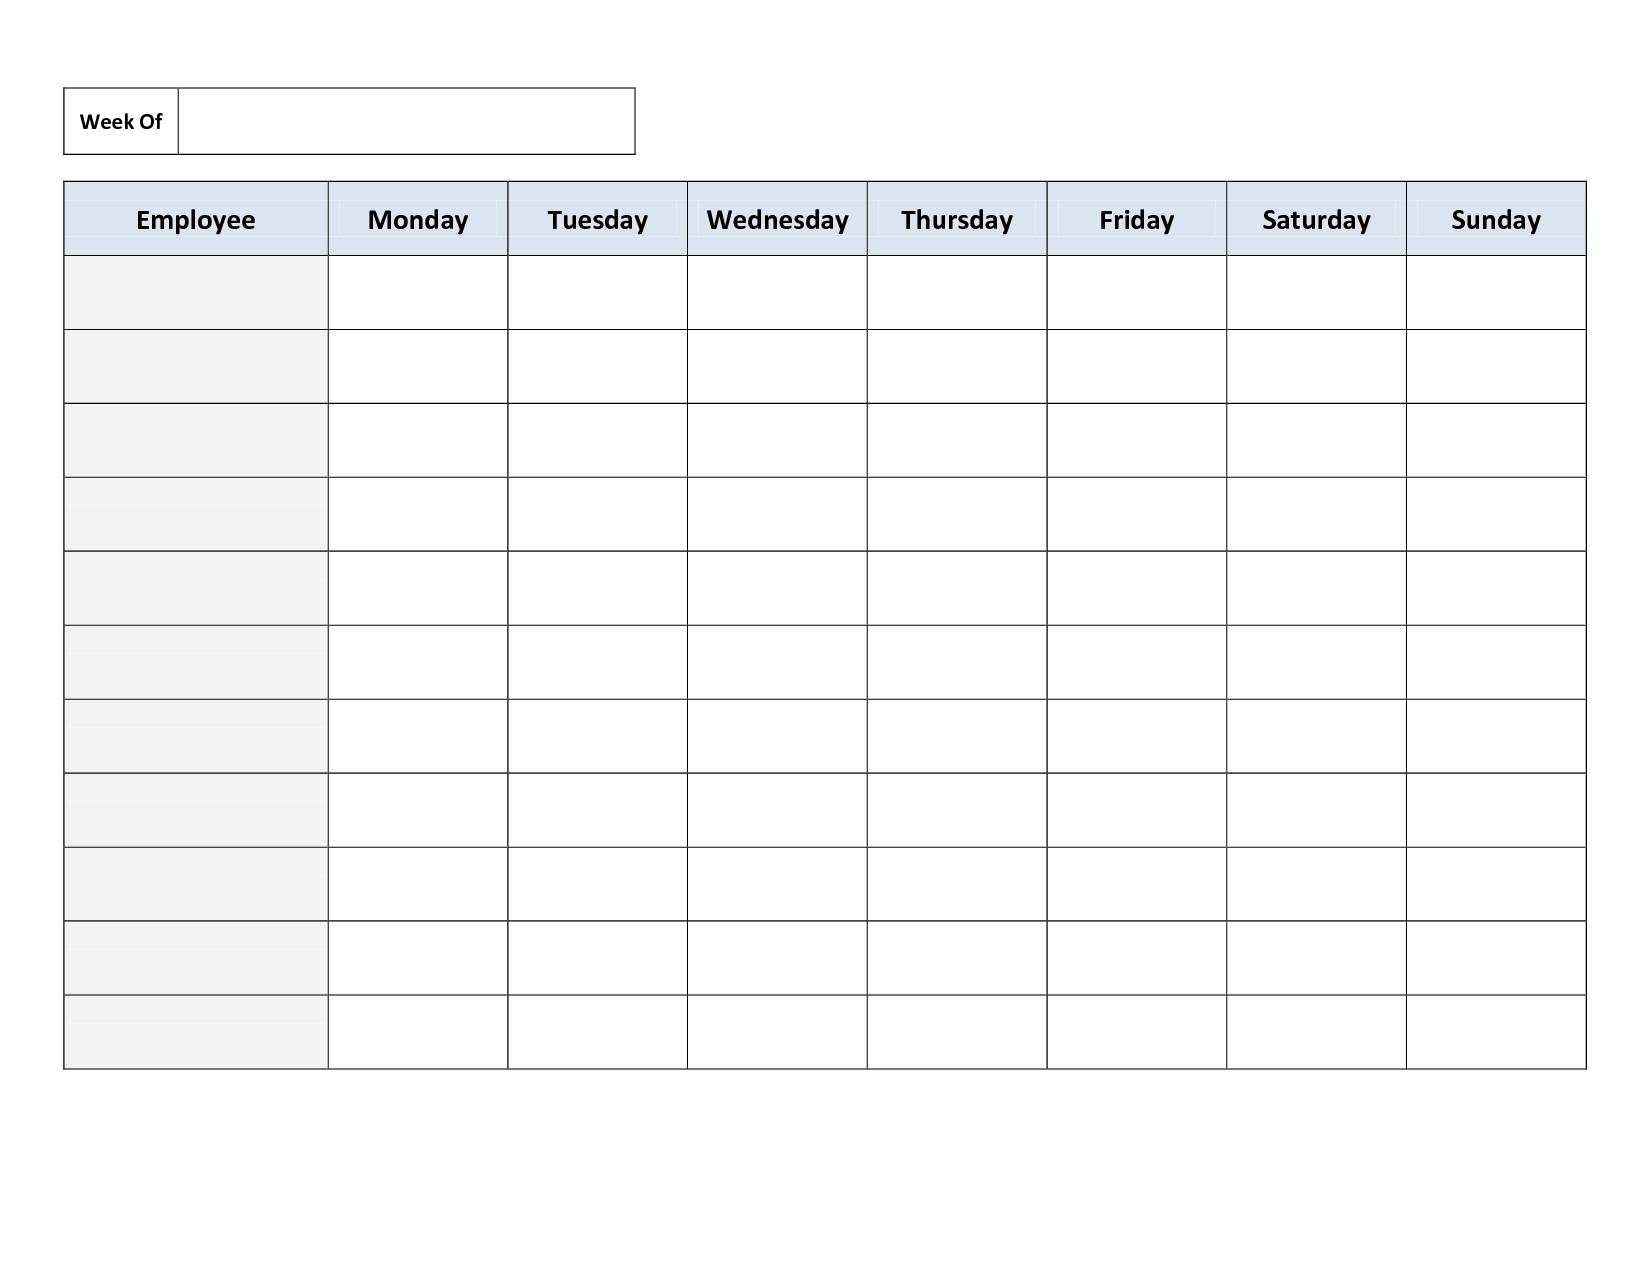 Blank Work Schedule Template 17+ Free Word, Excel Documents